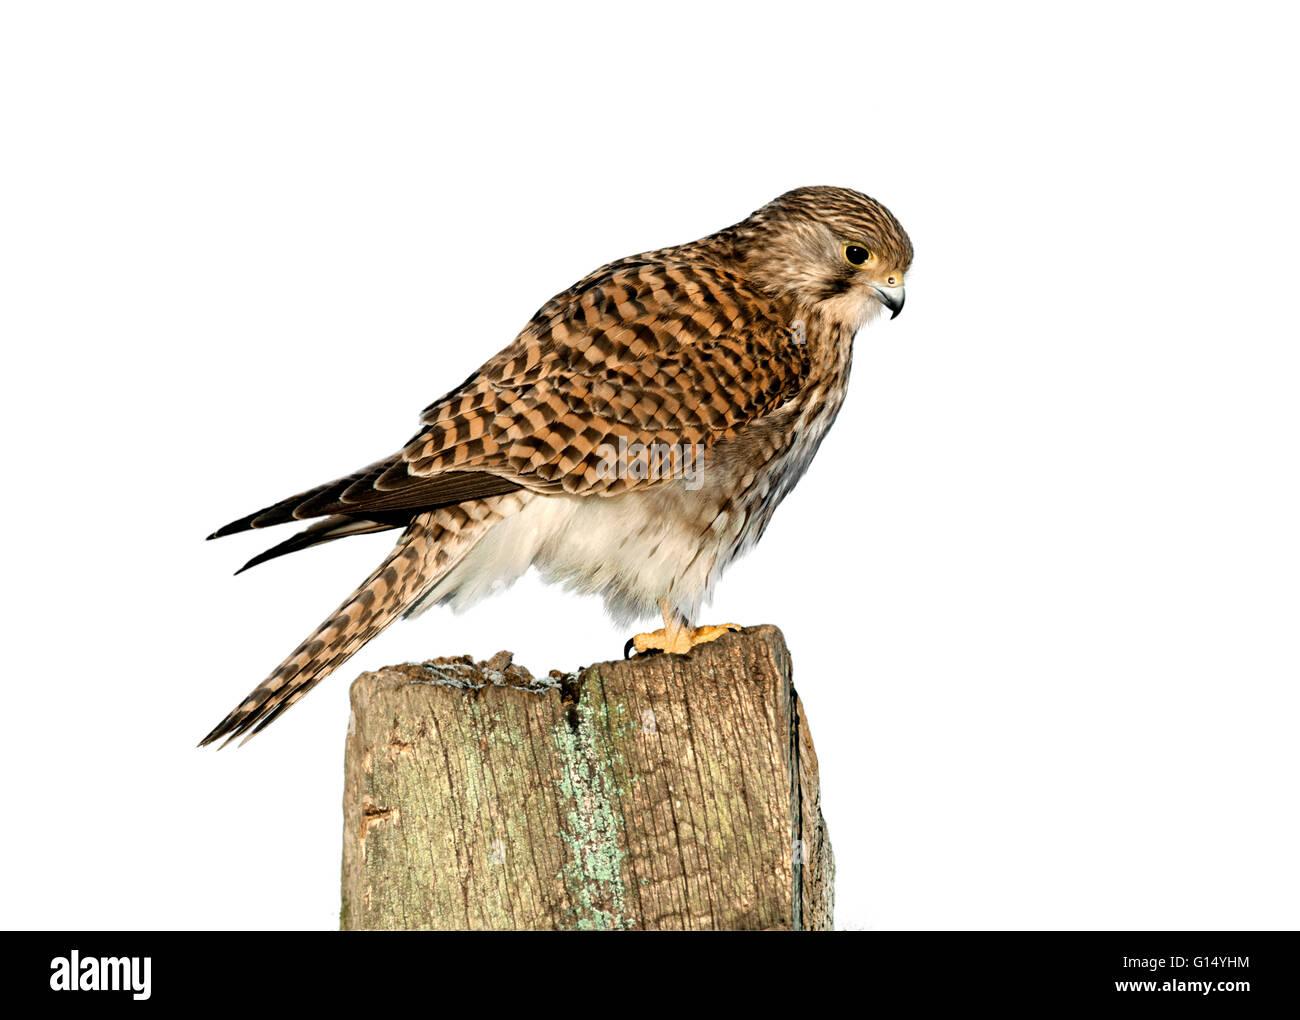 Kestrel - Falco tinnunculus - Stock Image